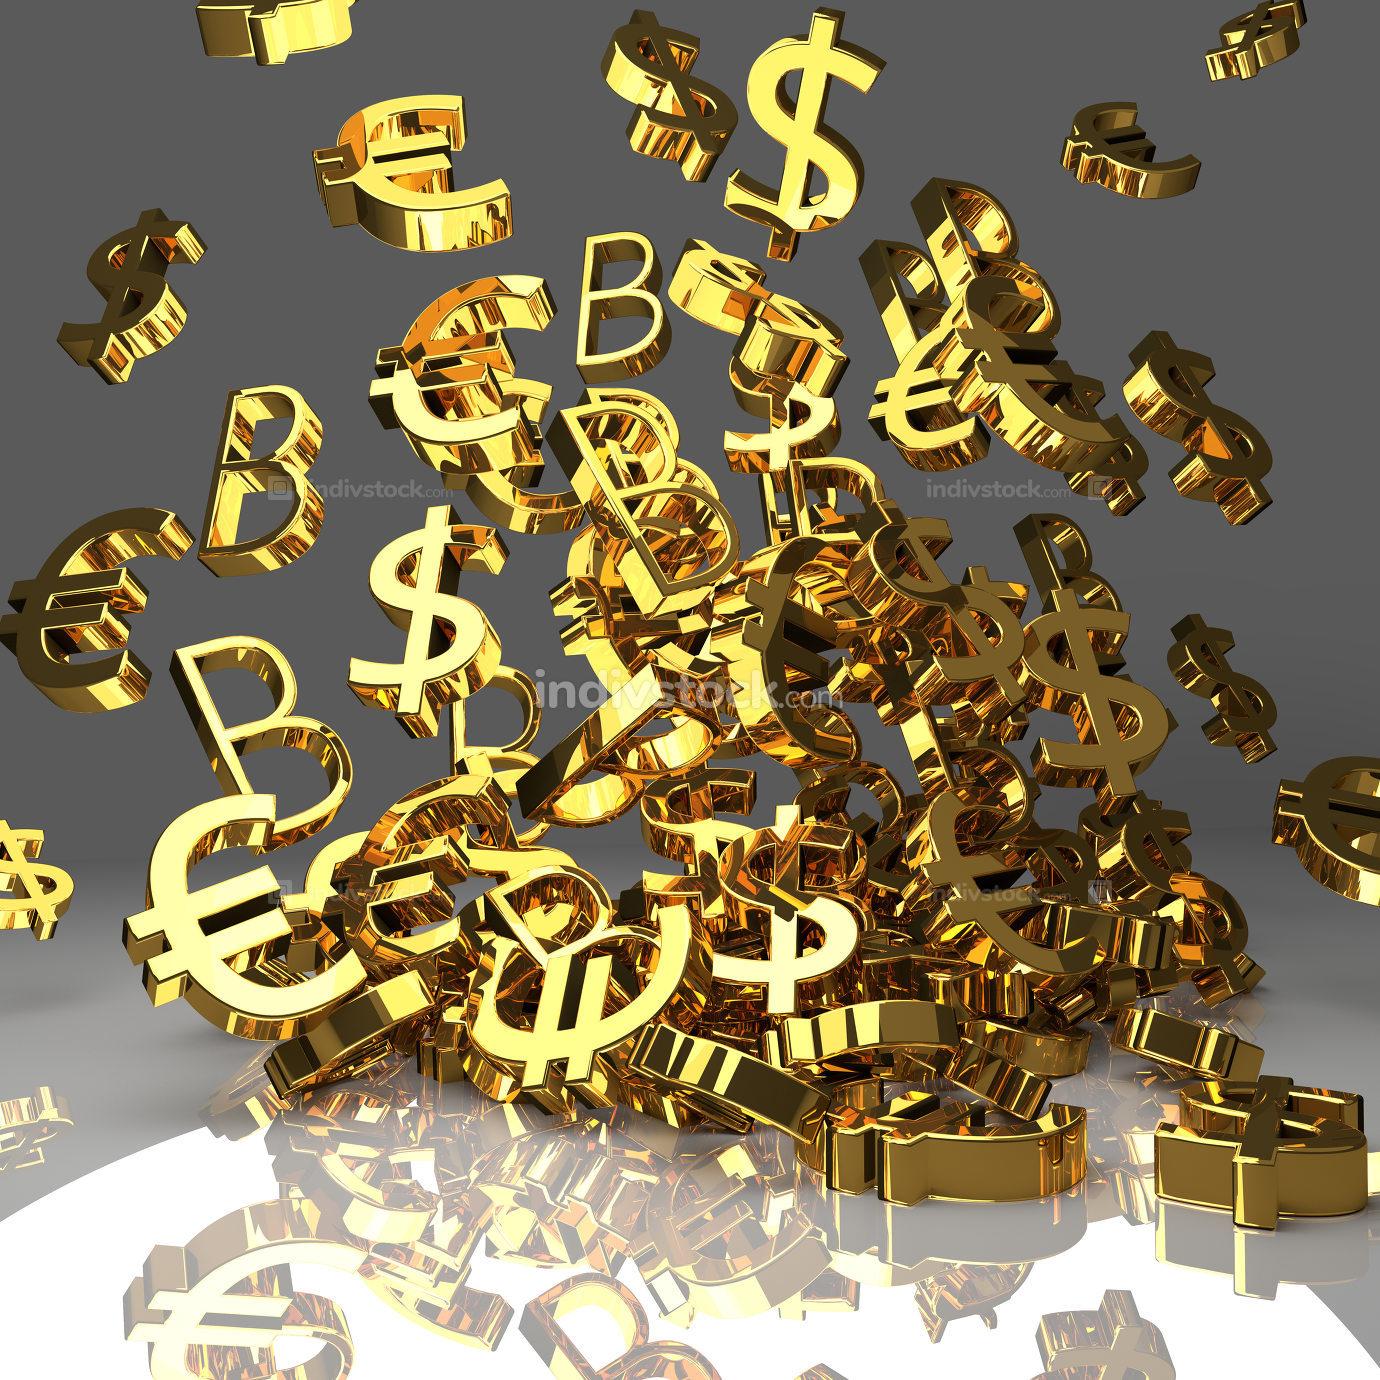 free download: golden Euro Dollar B Bitcoin falling pile 3d rendering